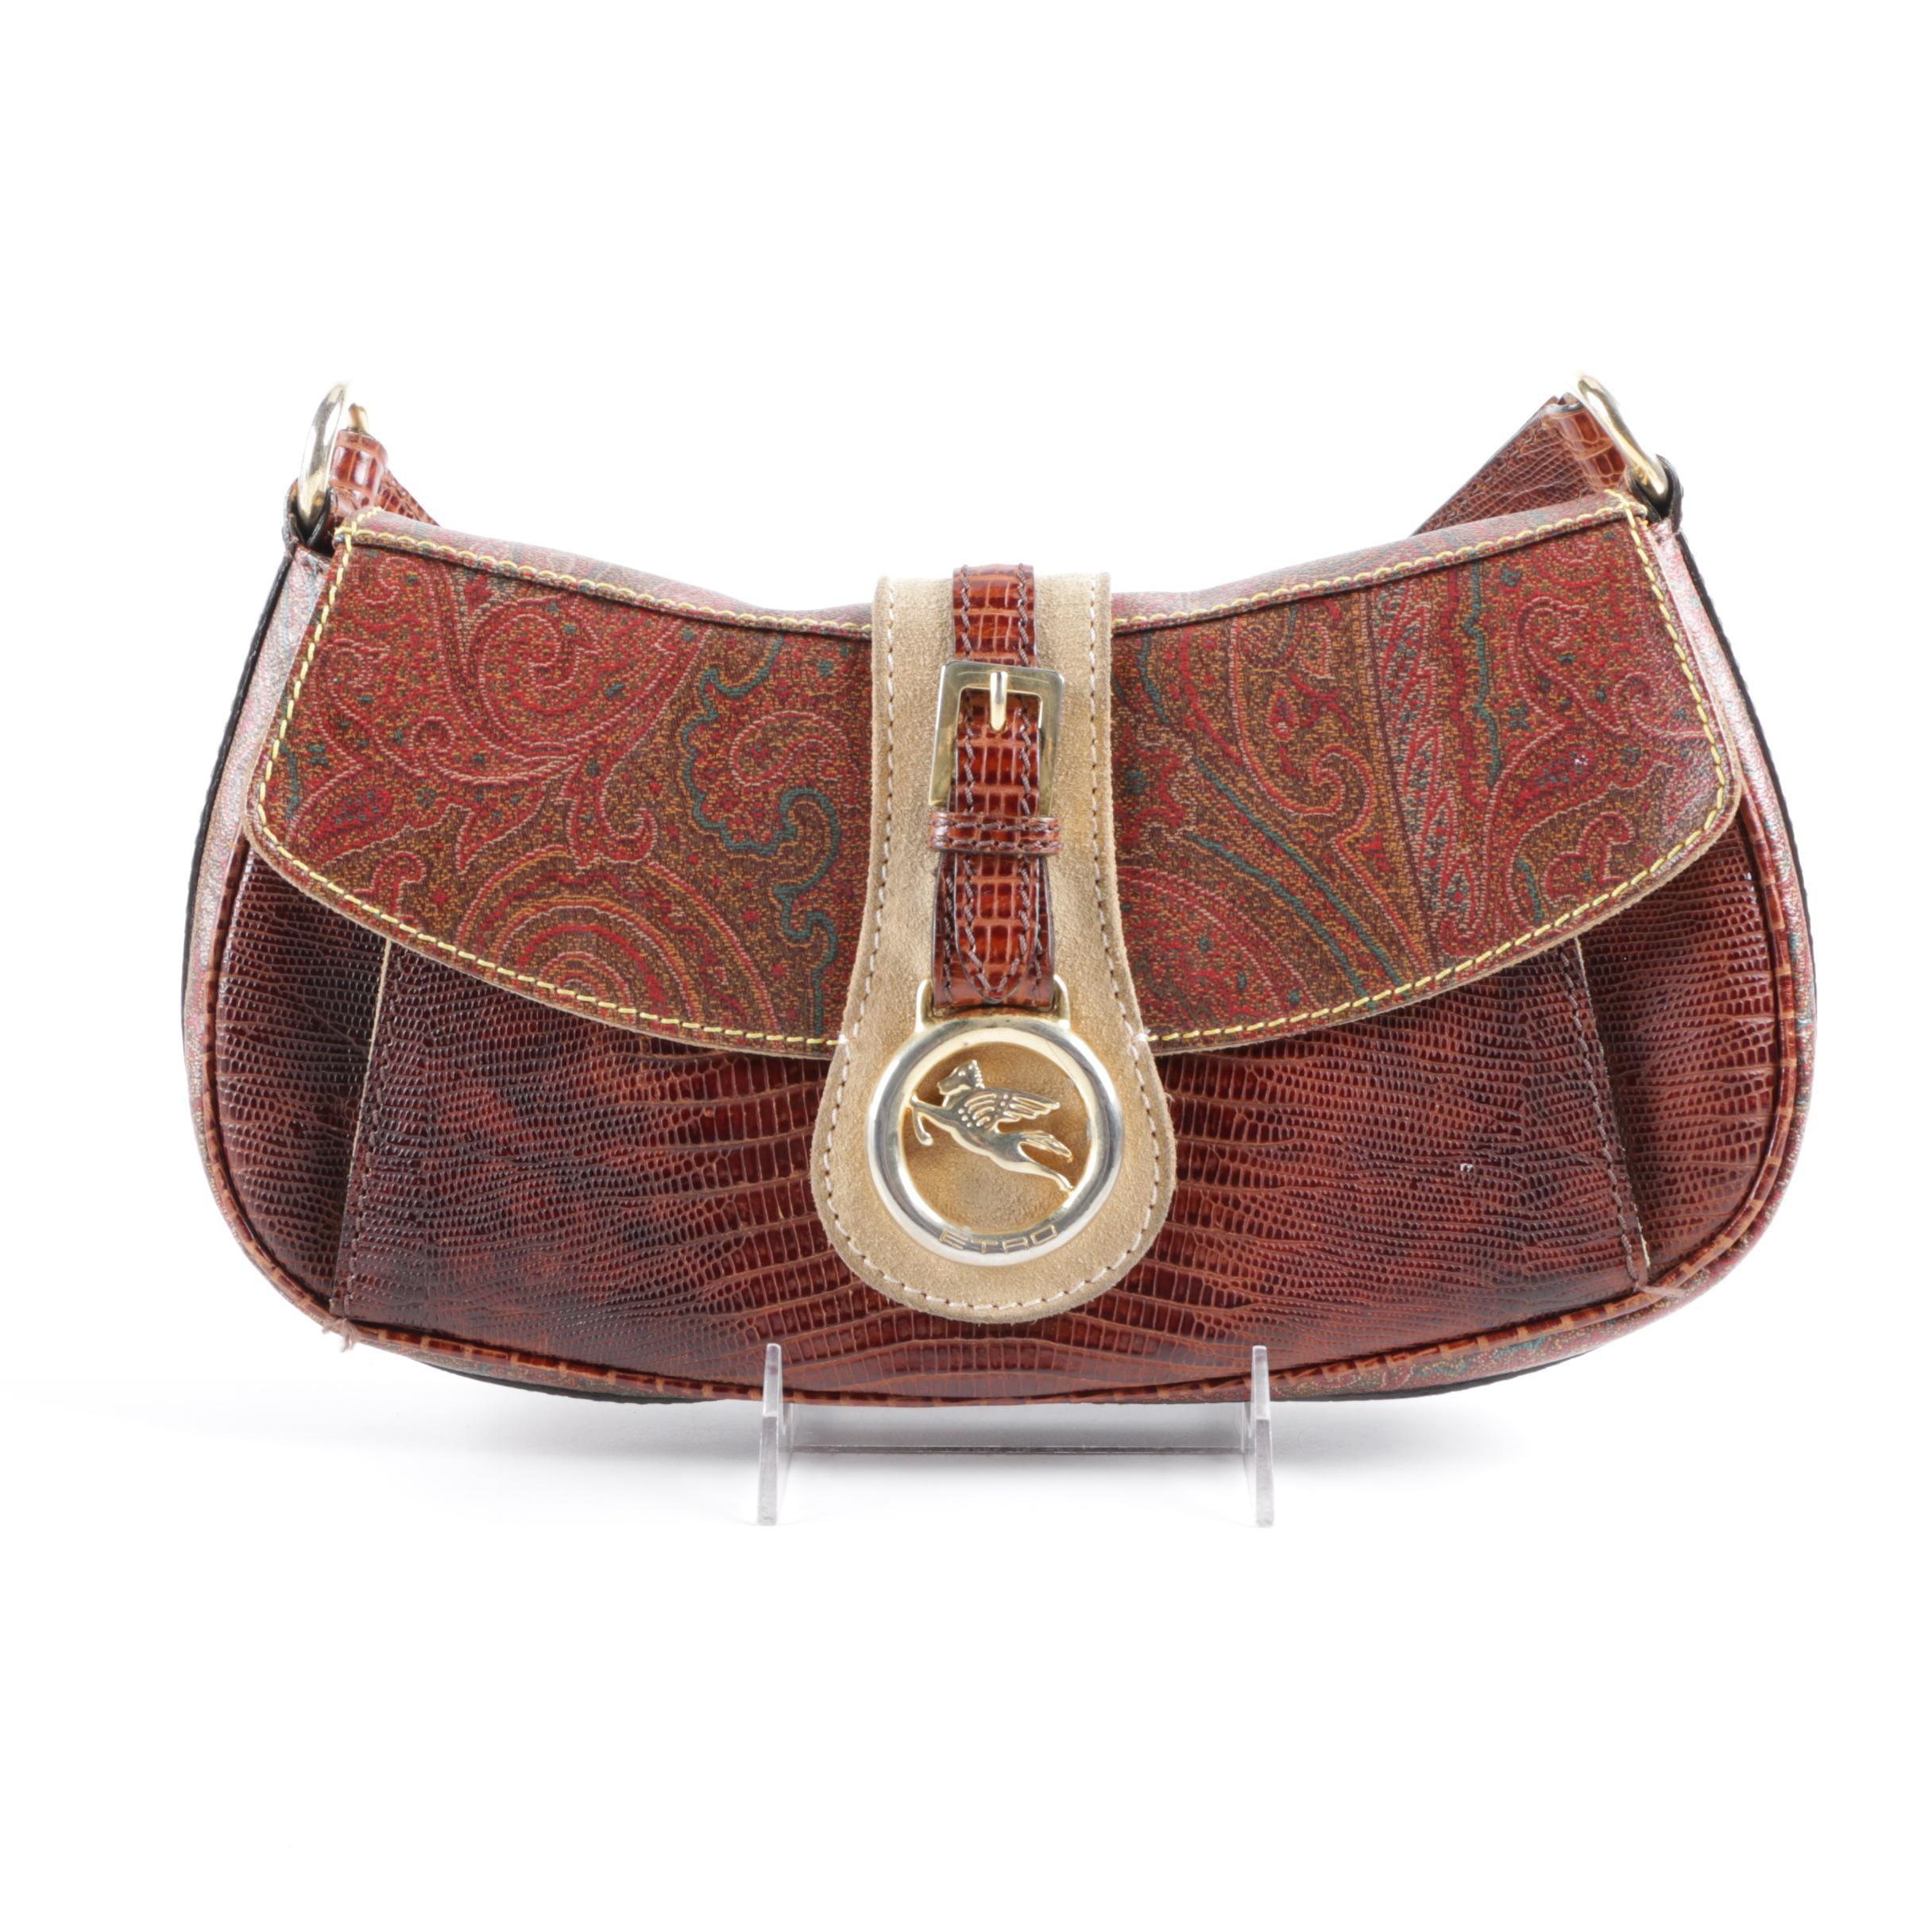 Etro Paisley Canvas and Leather Handbag